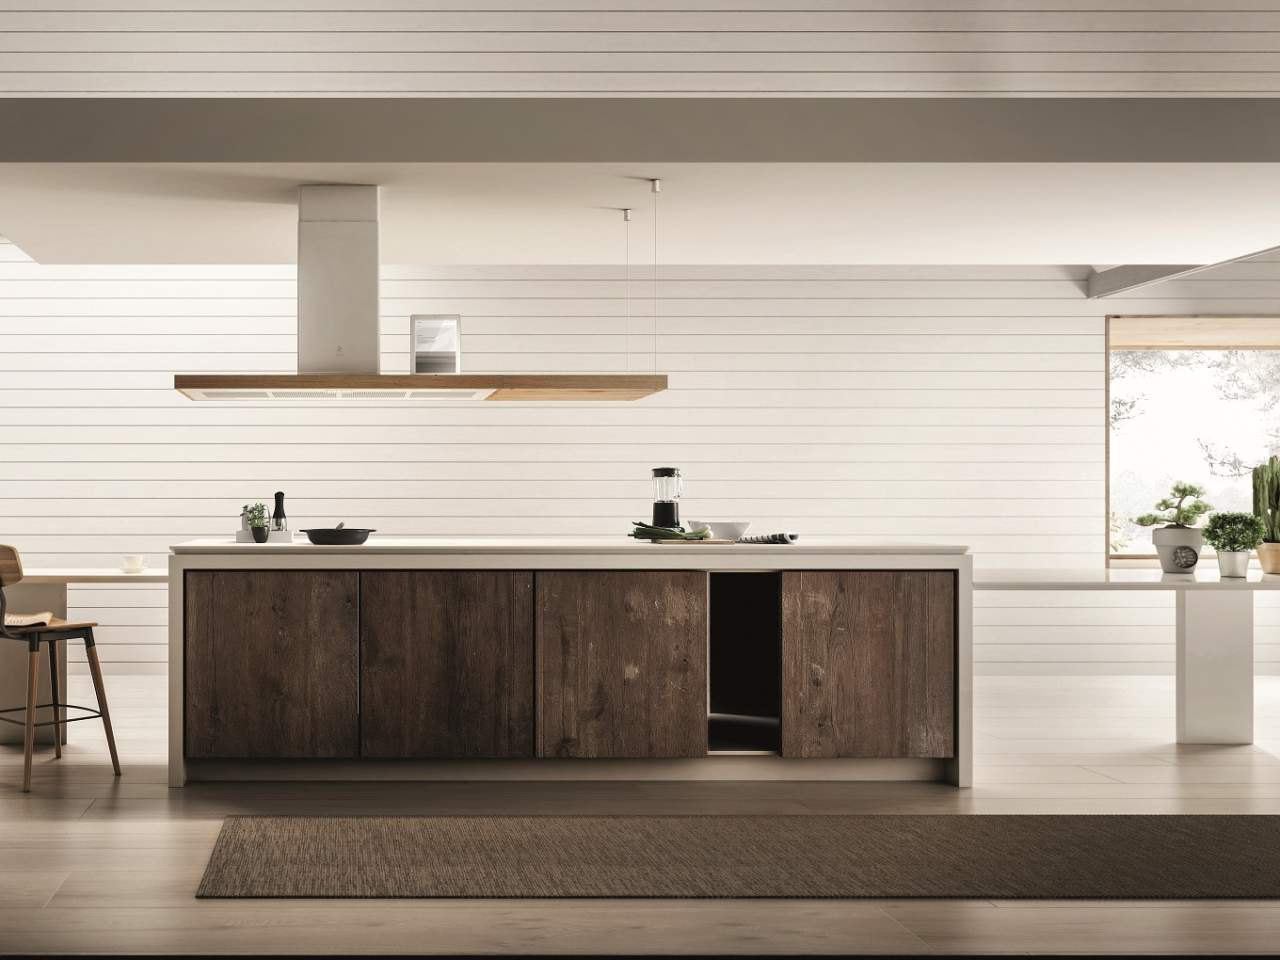 Elica e le nuove tendenze di stile in cucina ambiente cucina - Aziende cucine design ...